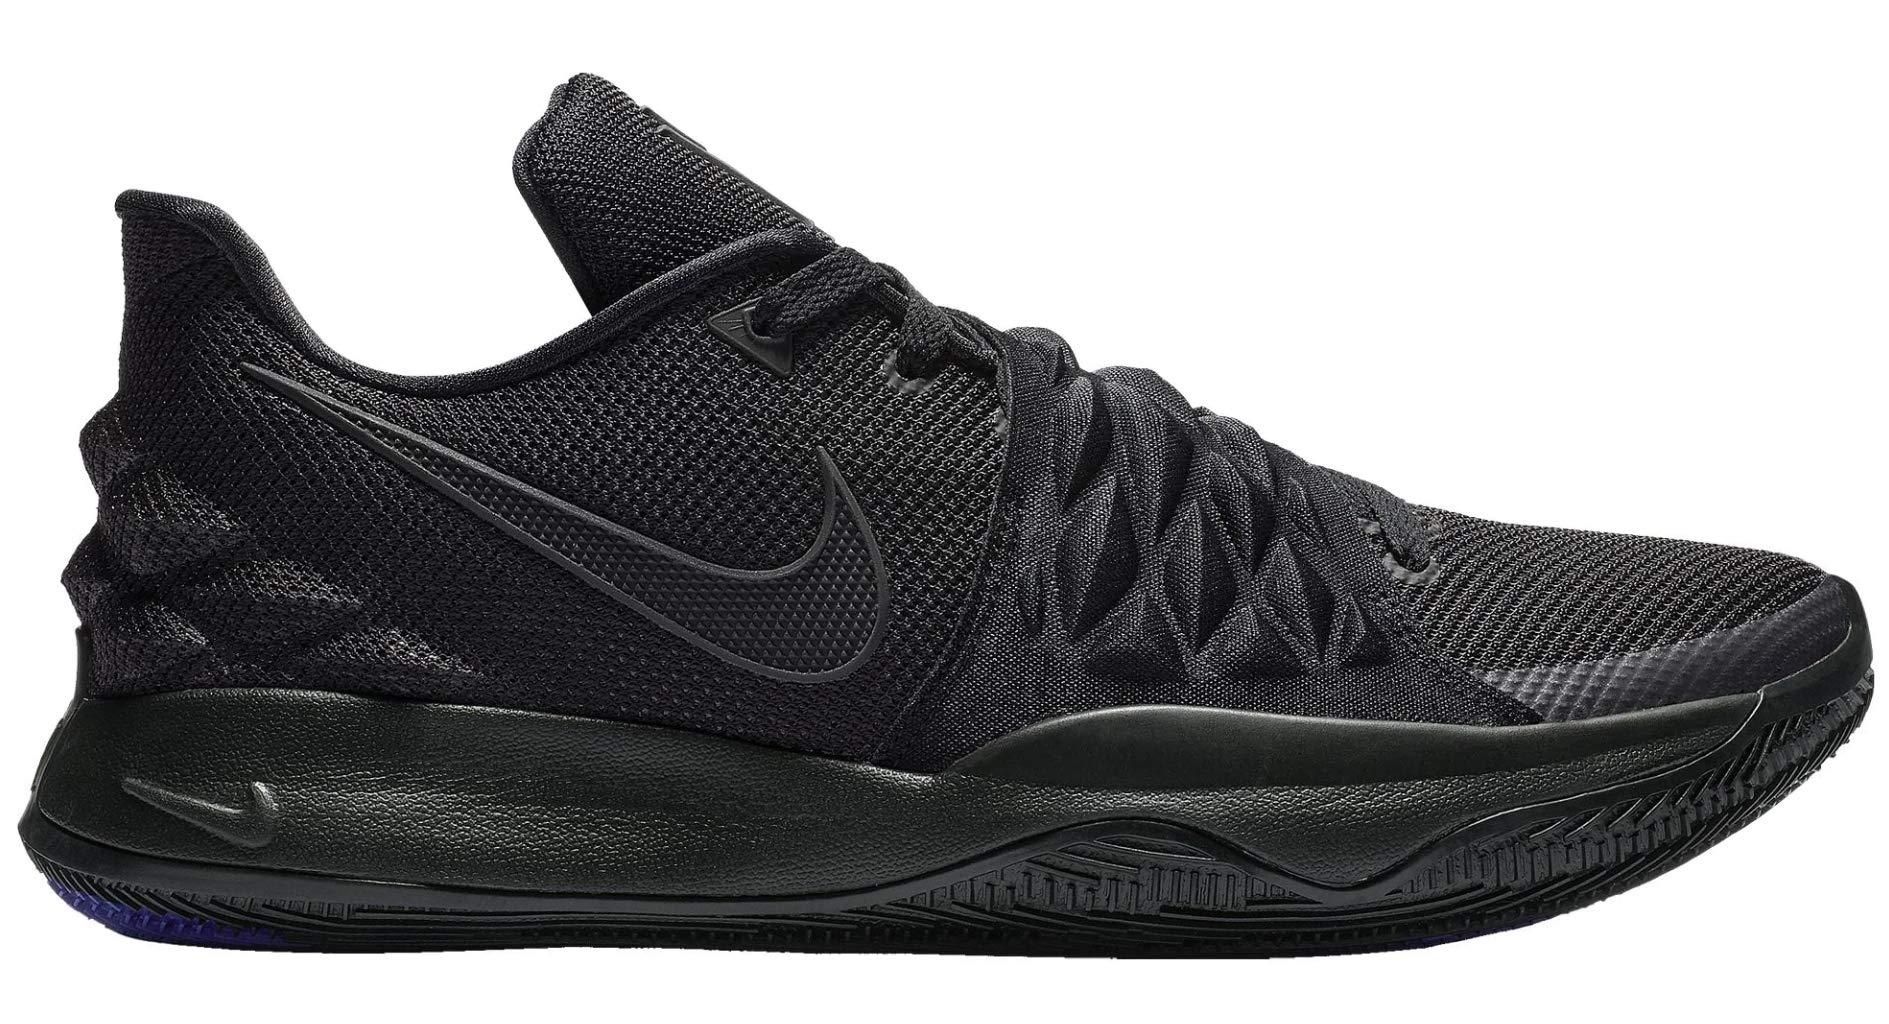 e40b75392e08b6 Nike Mens Kyrie Low Basketball Shoes Fashion Sneakers, Black/Black Size 10  US